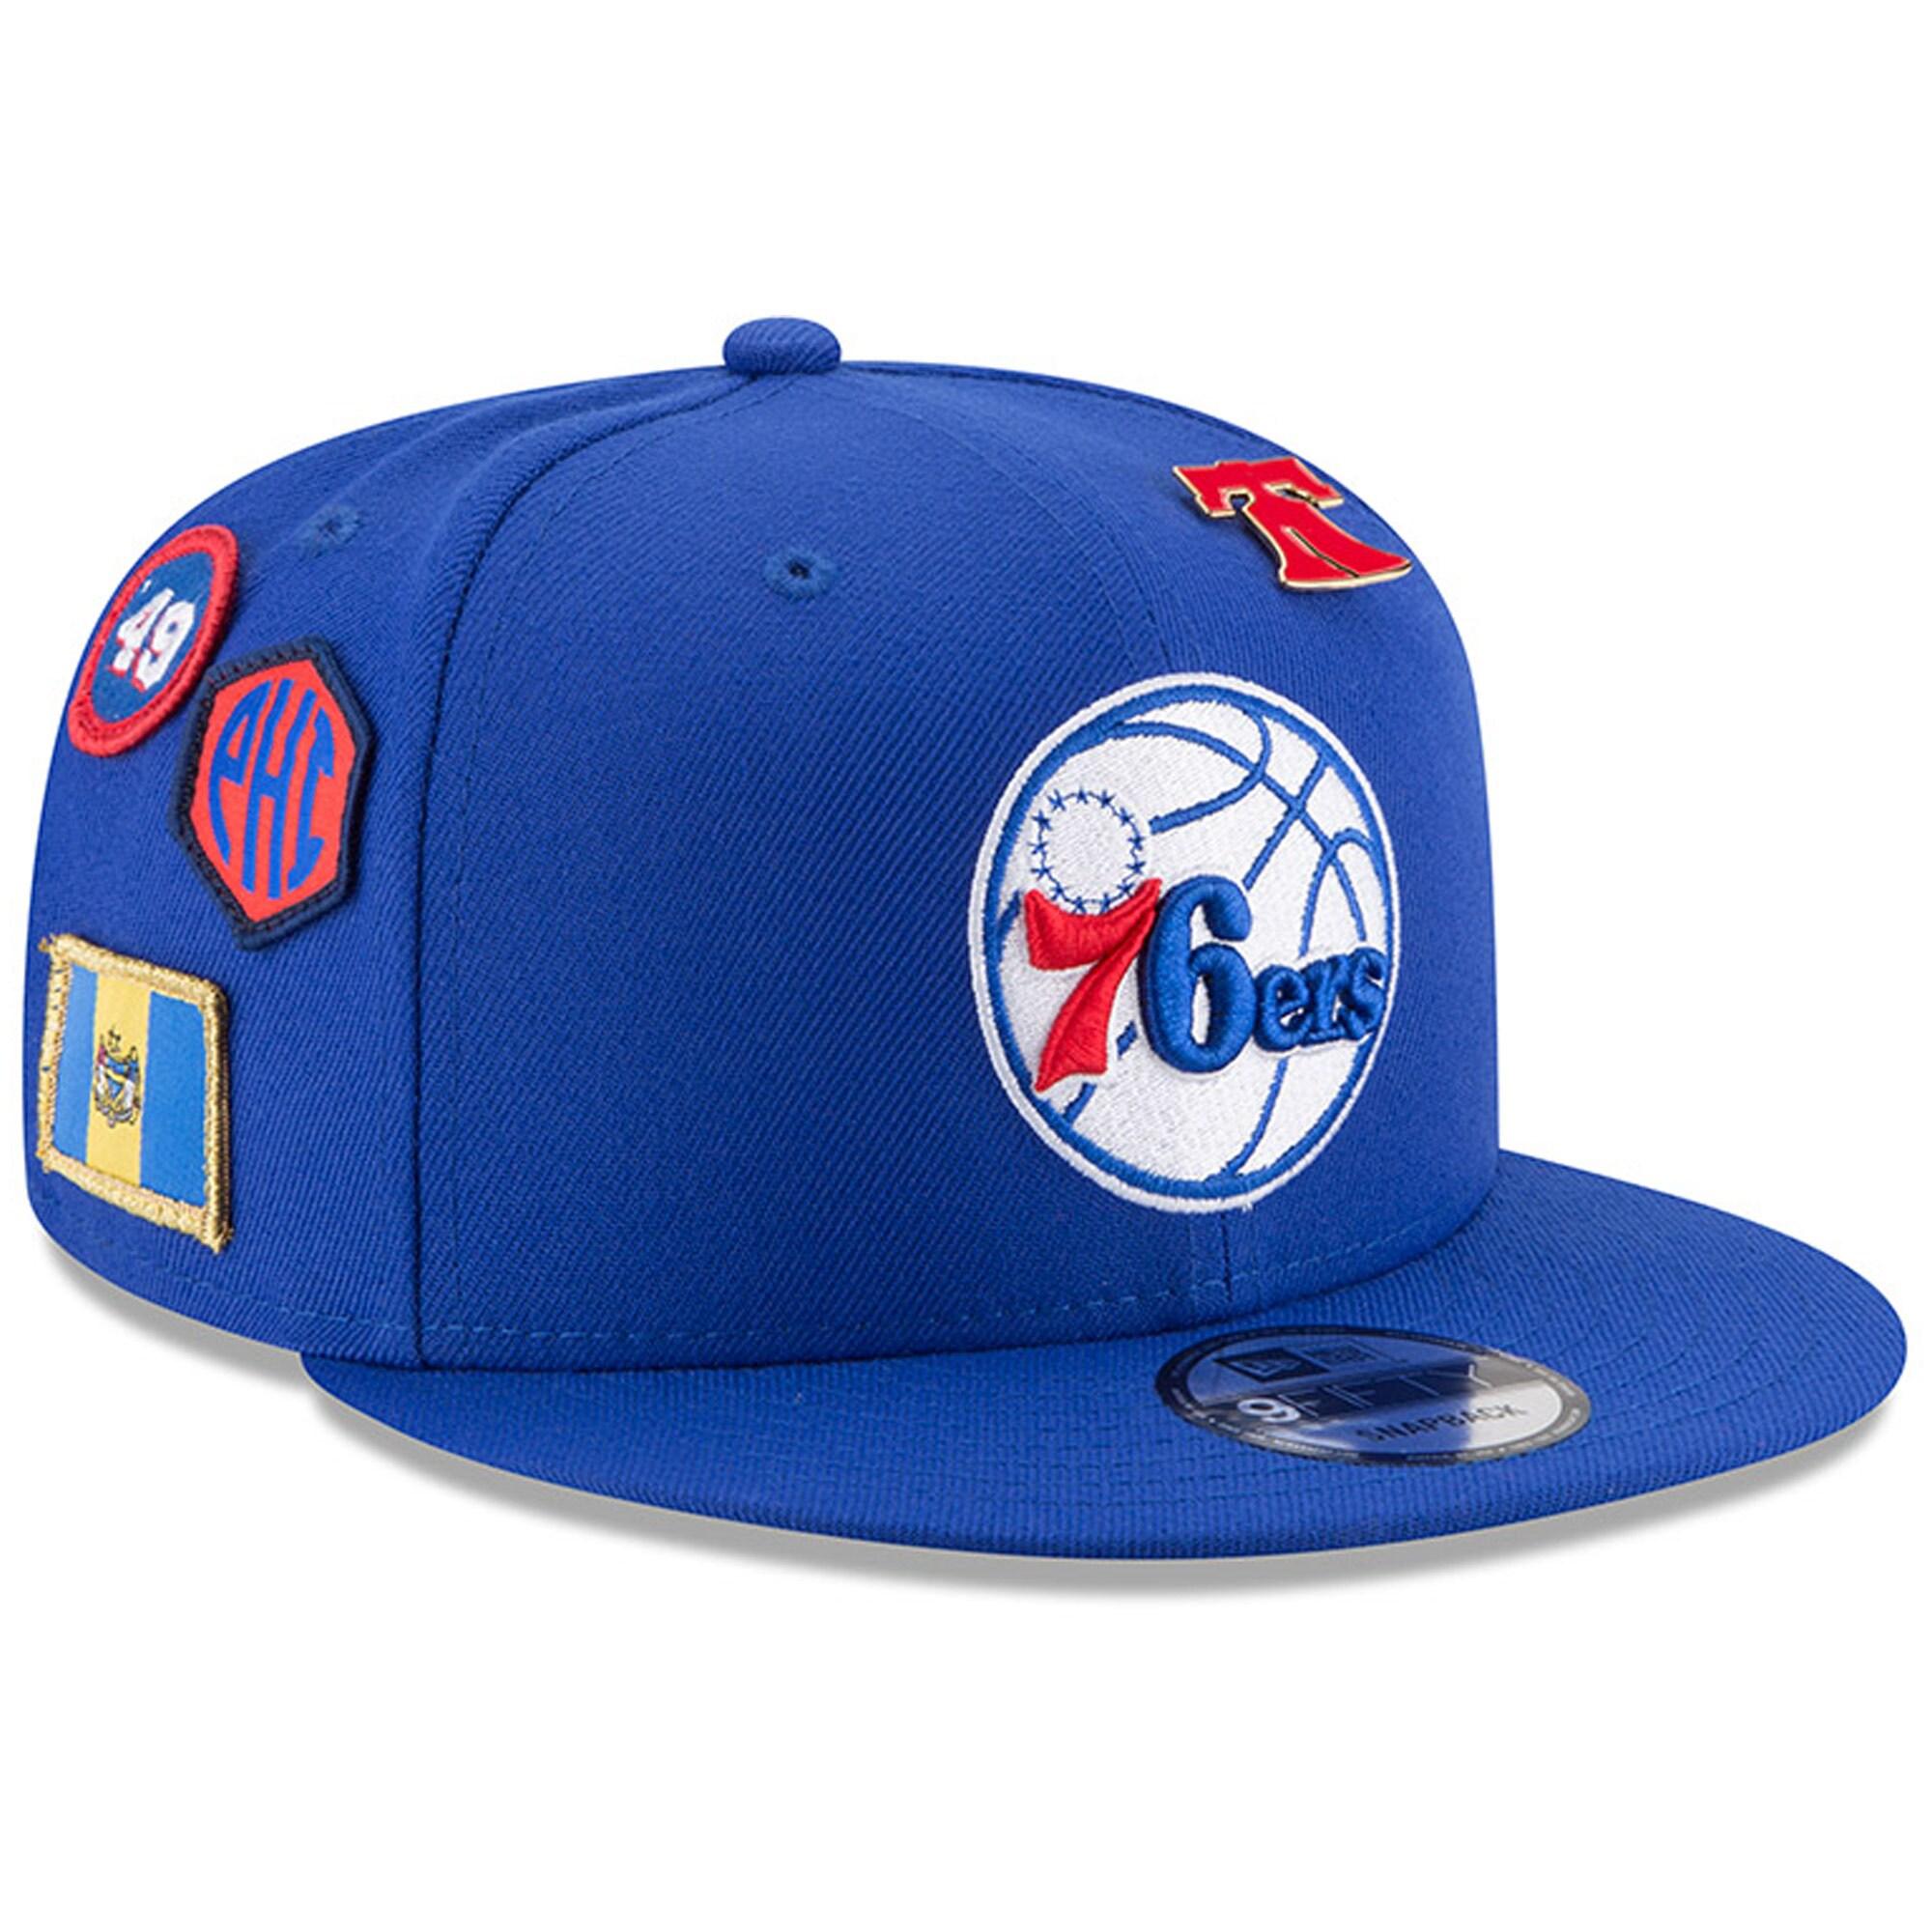 Philadelphia 76ers New Era 2018 Draft 9FIFTY Adjustable Hat - Royal